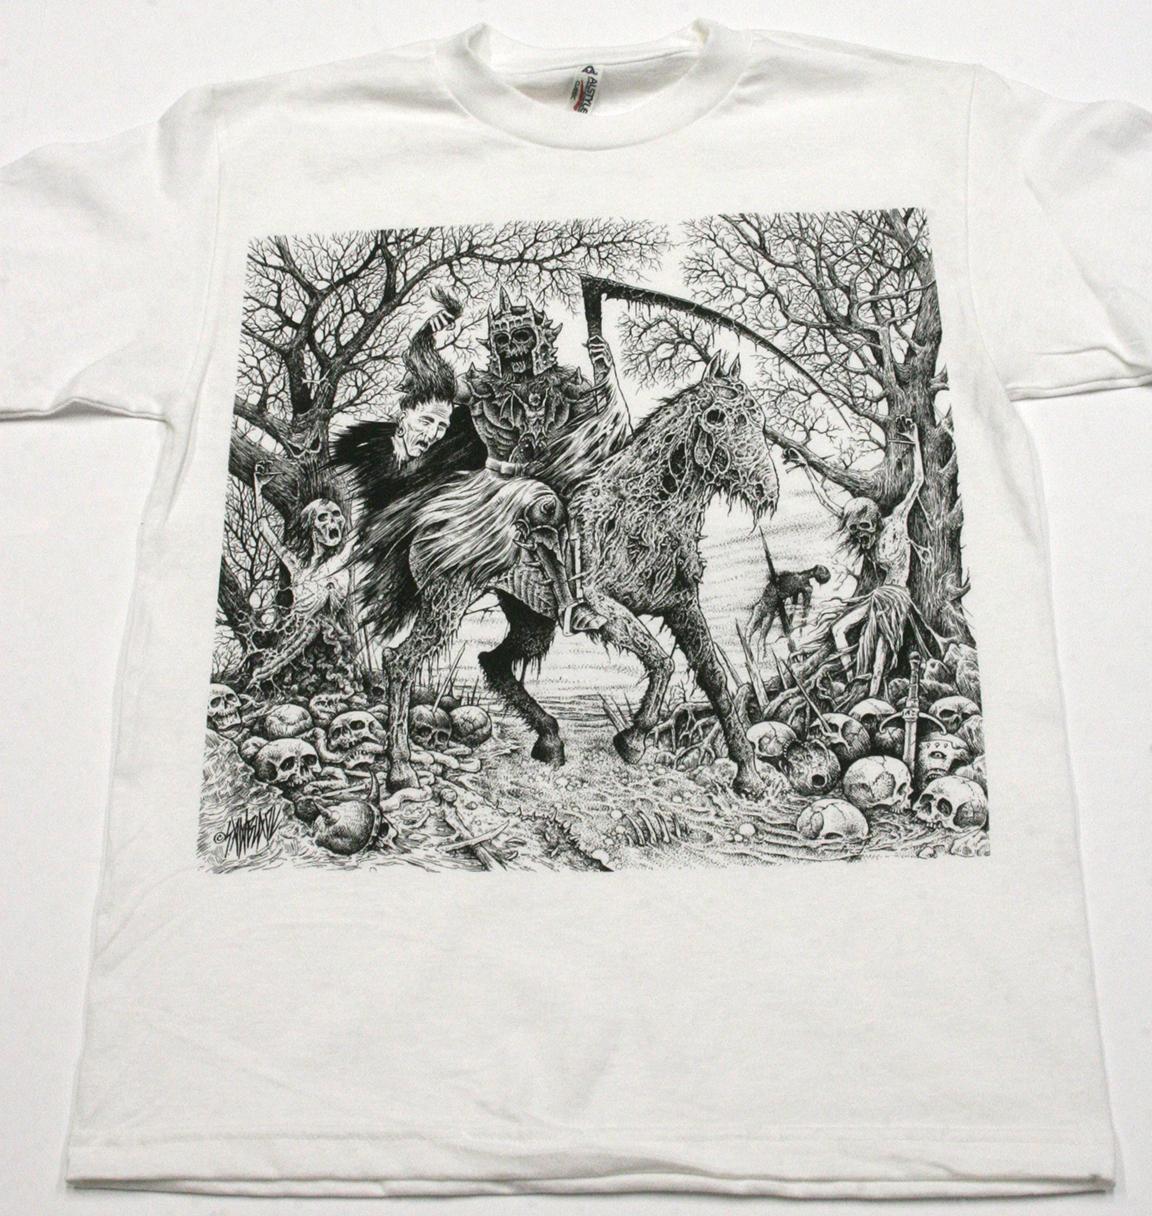 Screen Printed T Shirts Near Me